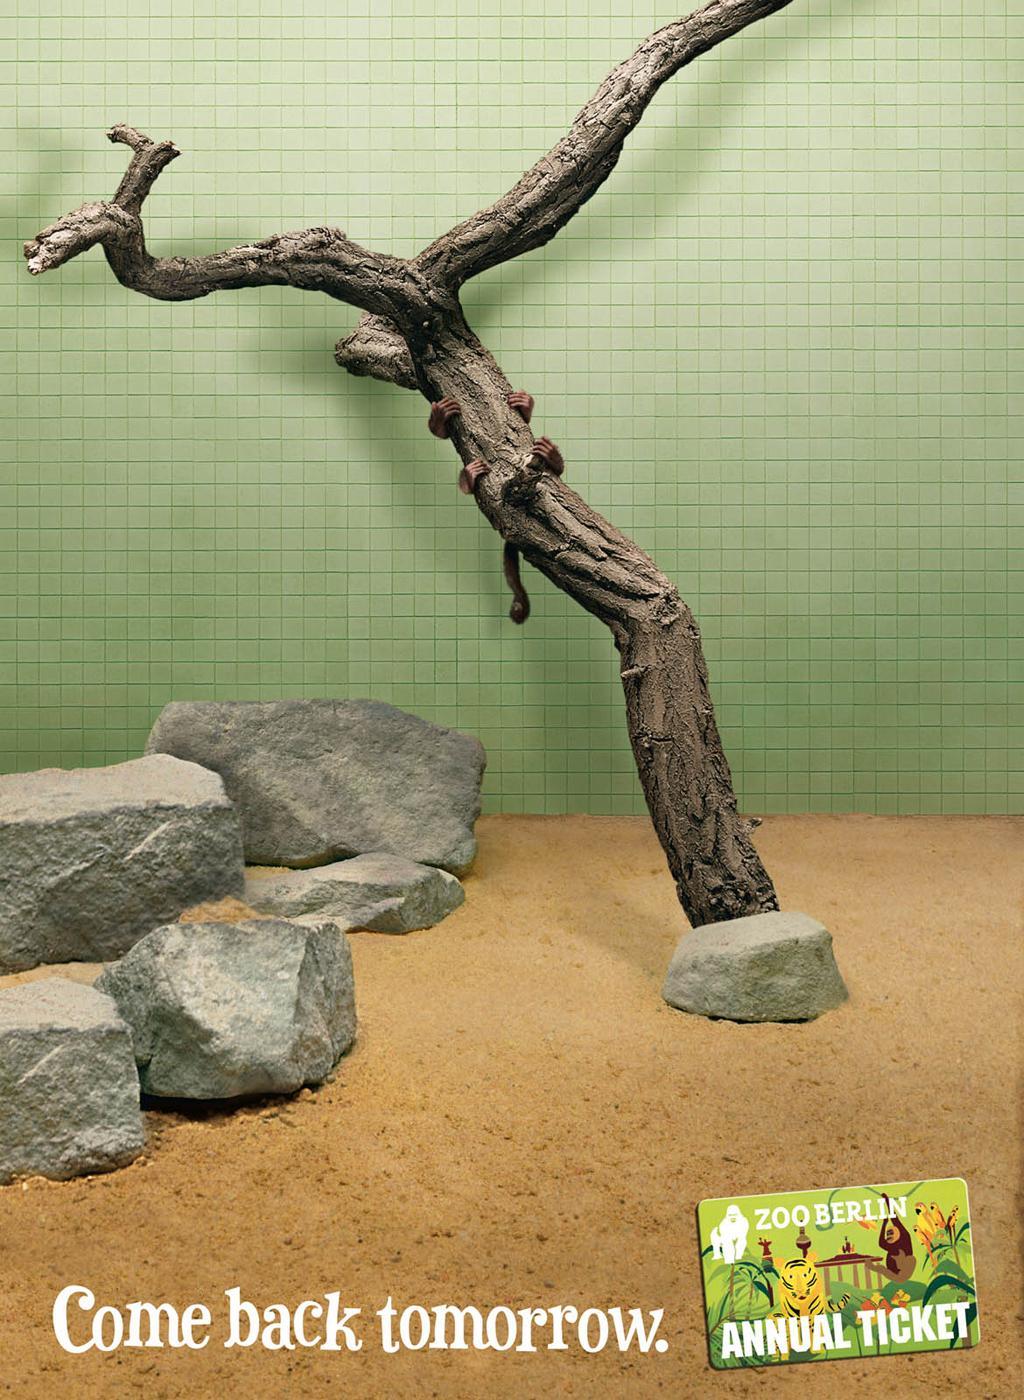 Zoo Berlin Print Ad -  Come back tomorrow